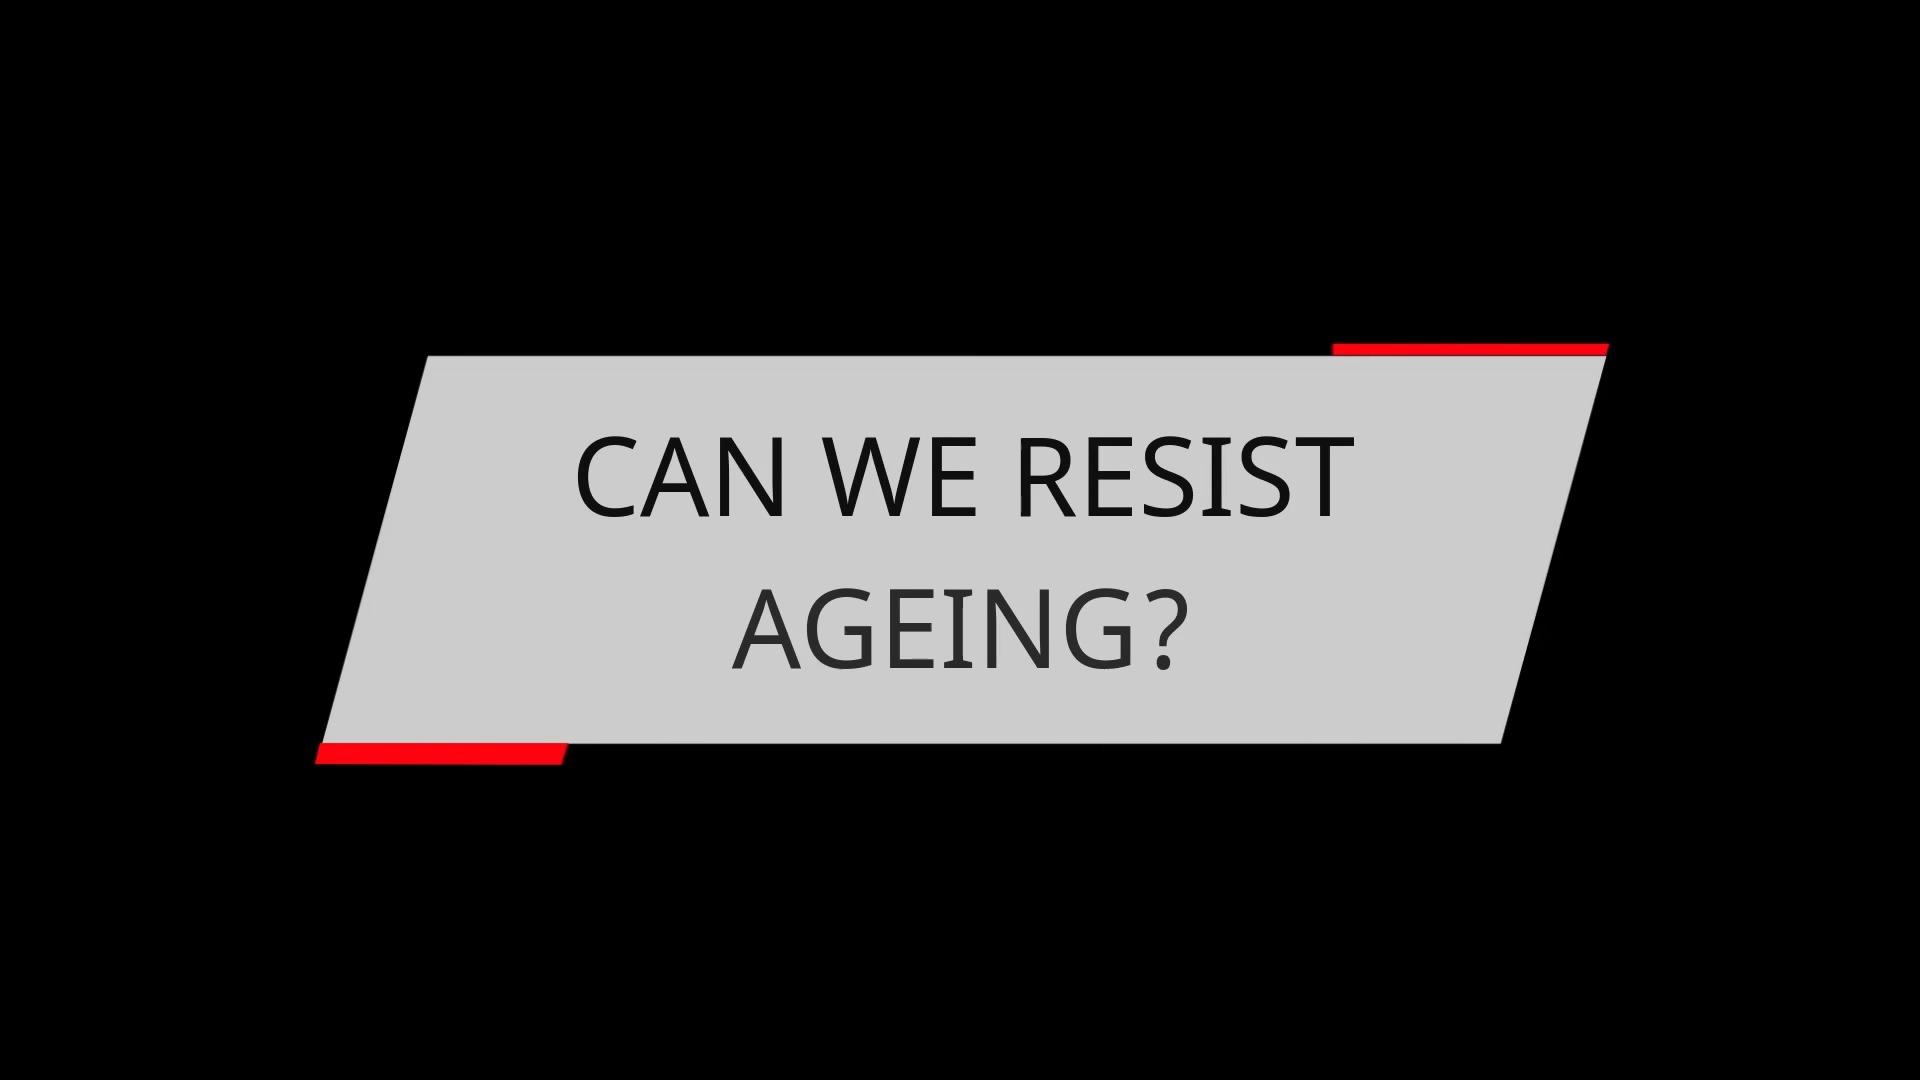 CAN WE RESIST AGEING